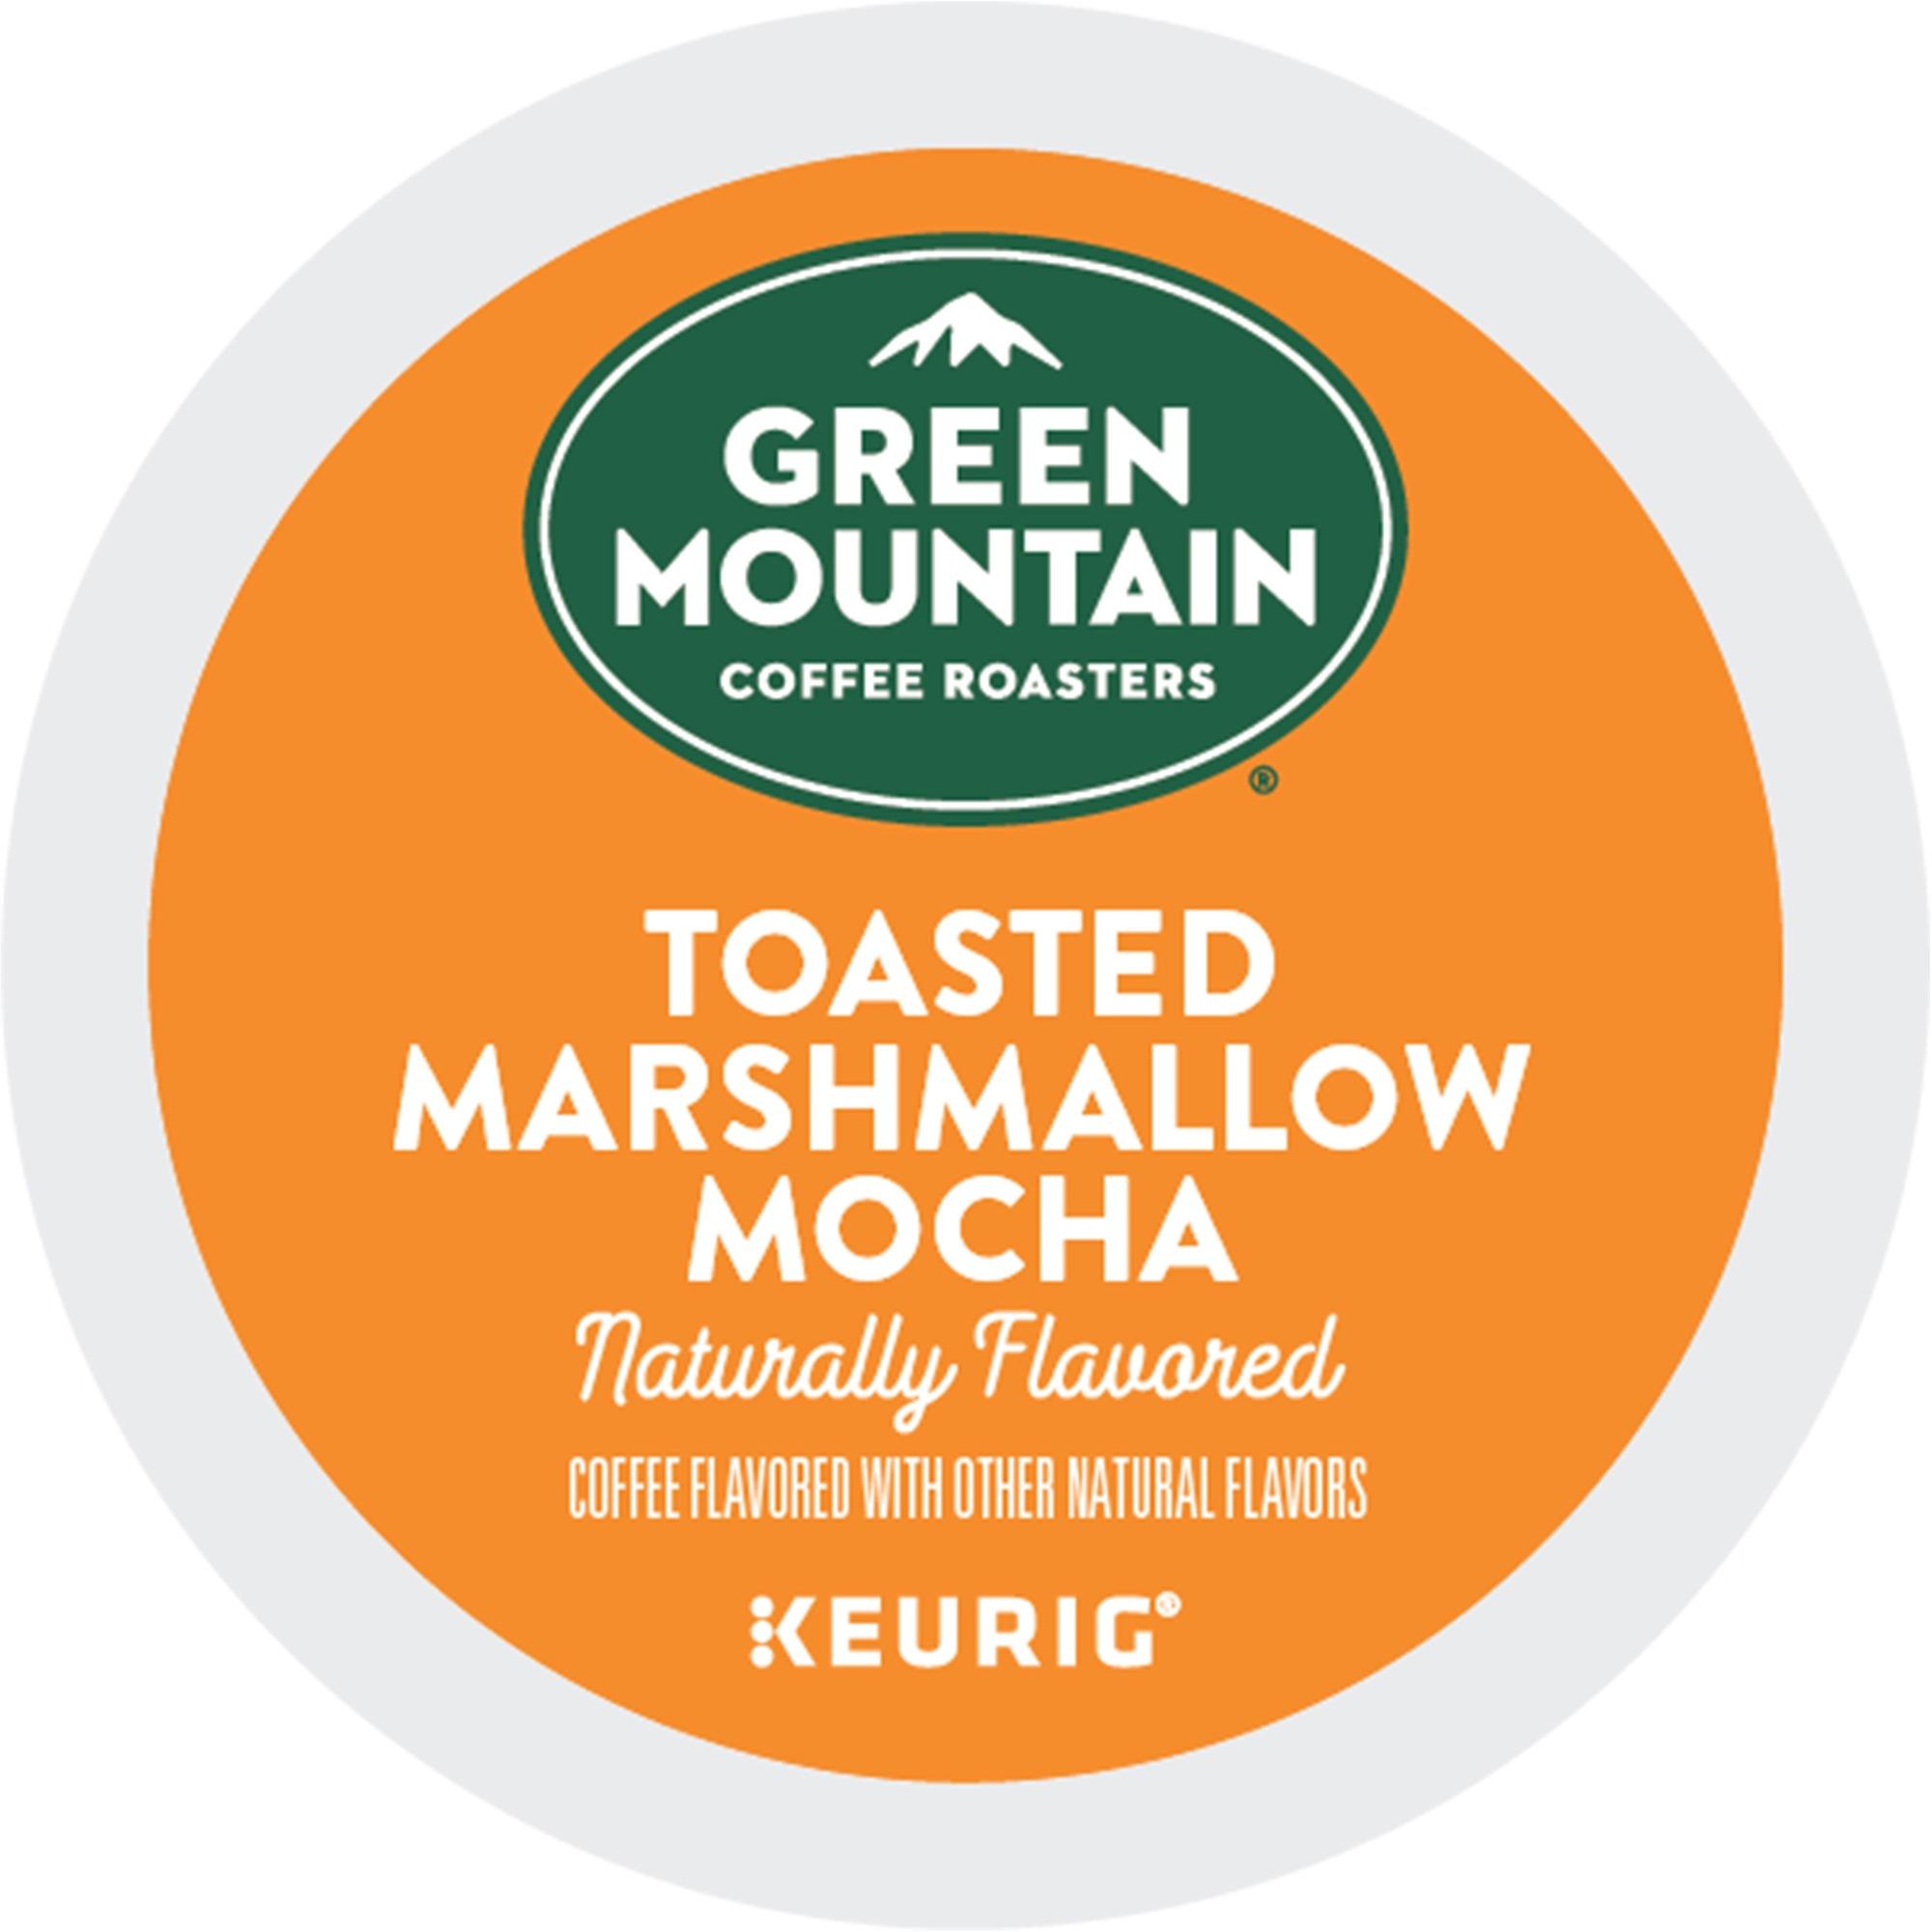 GMT79752 Green Mountain Coffee Roasters